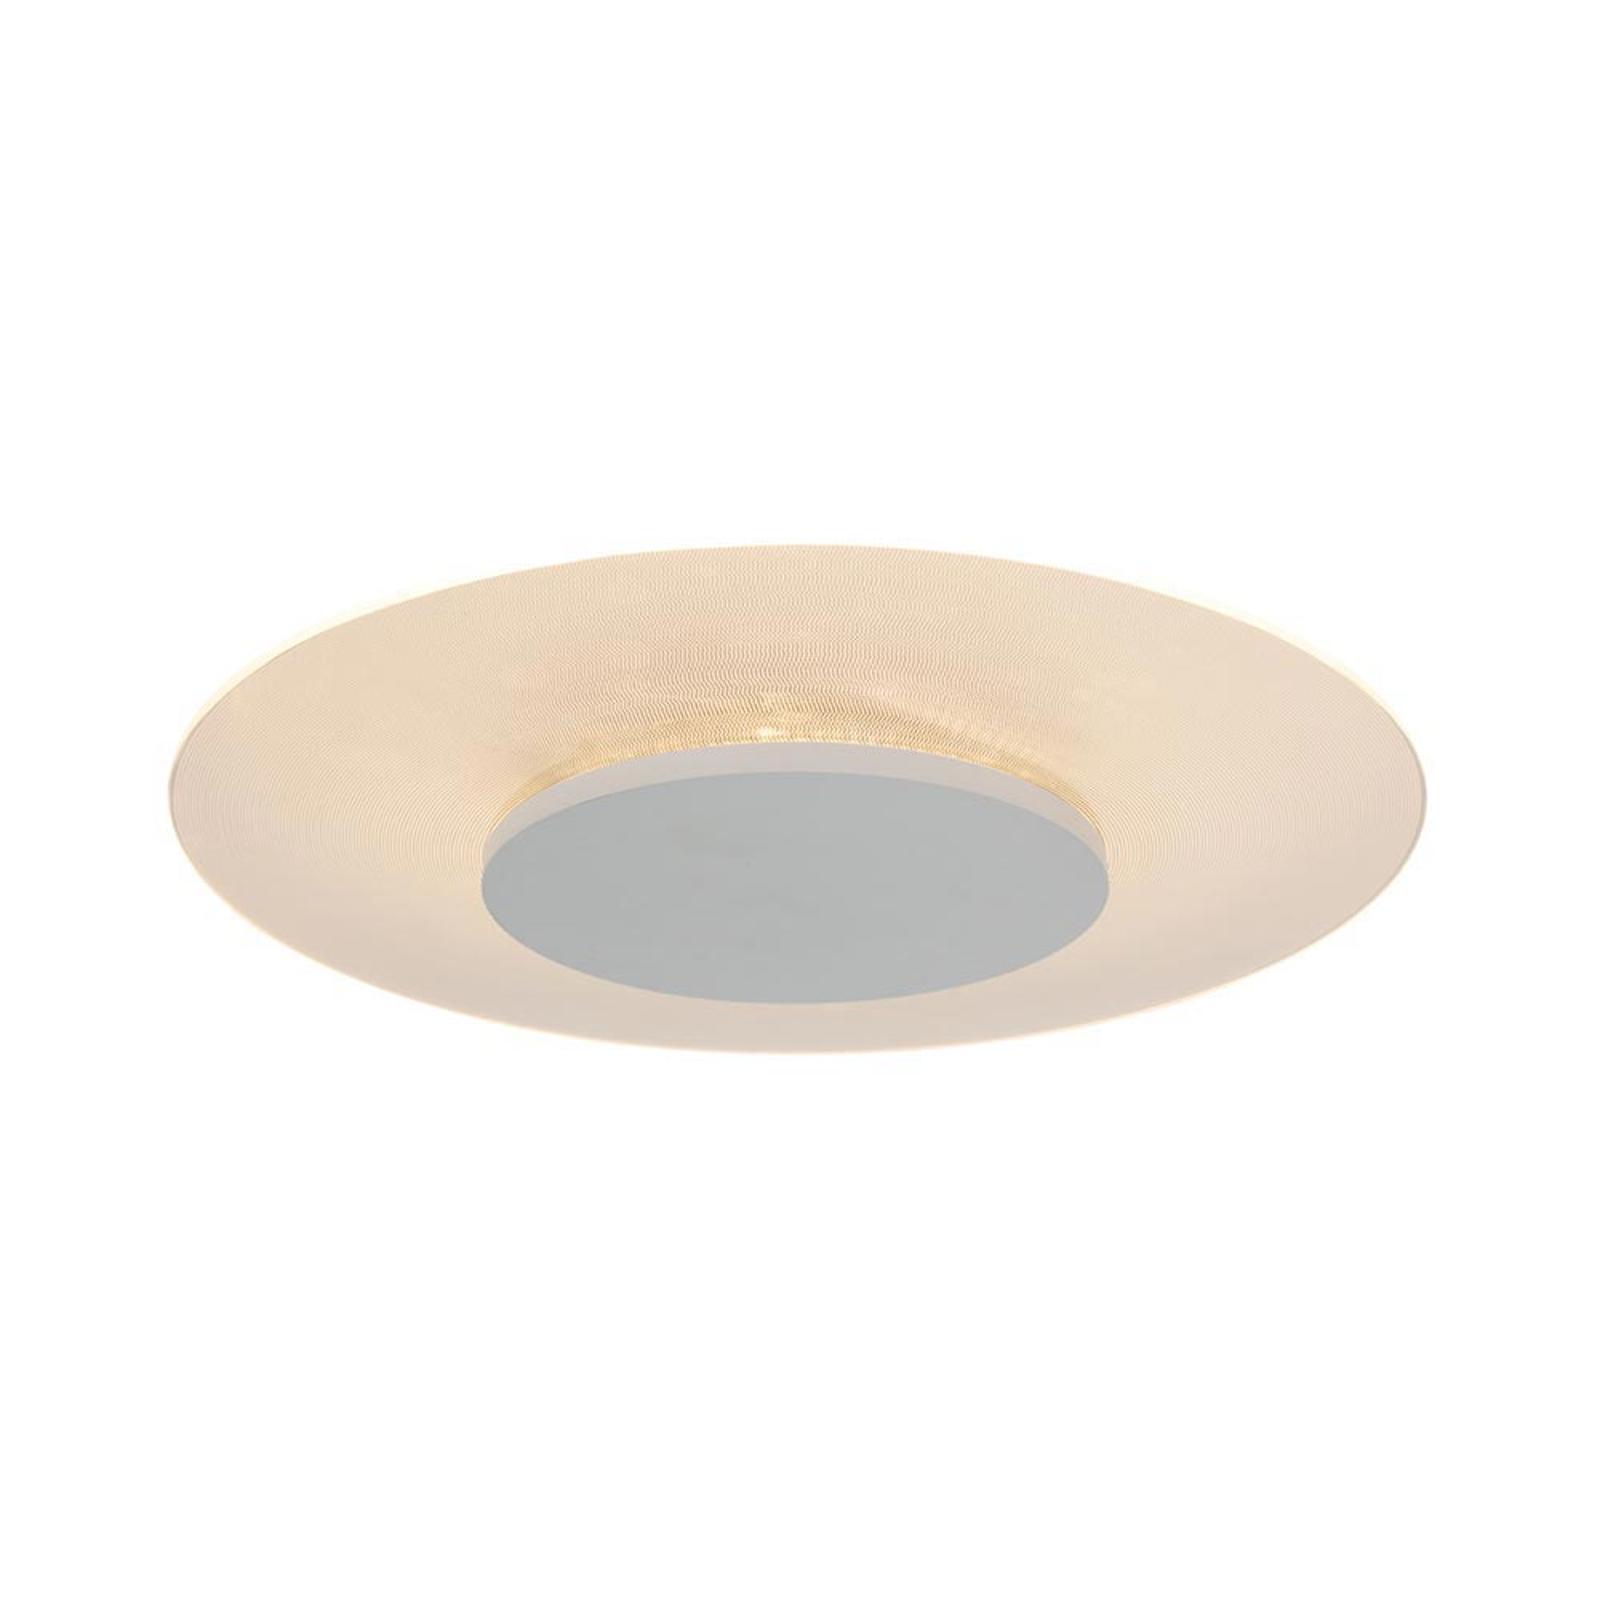 Ronde LED plafondlamp Birma in wit, dimbaar